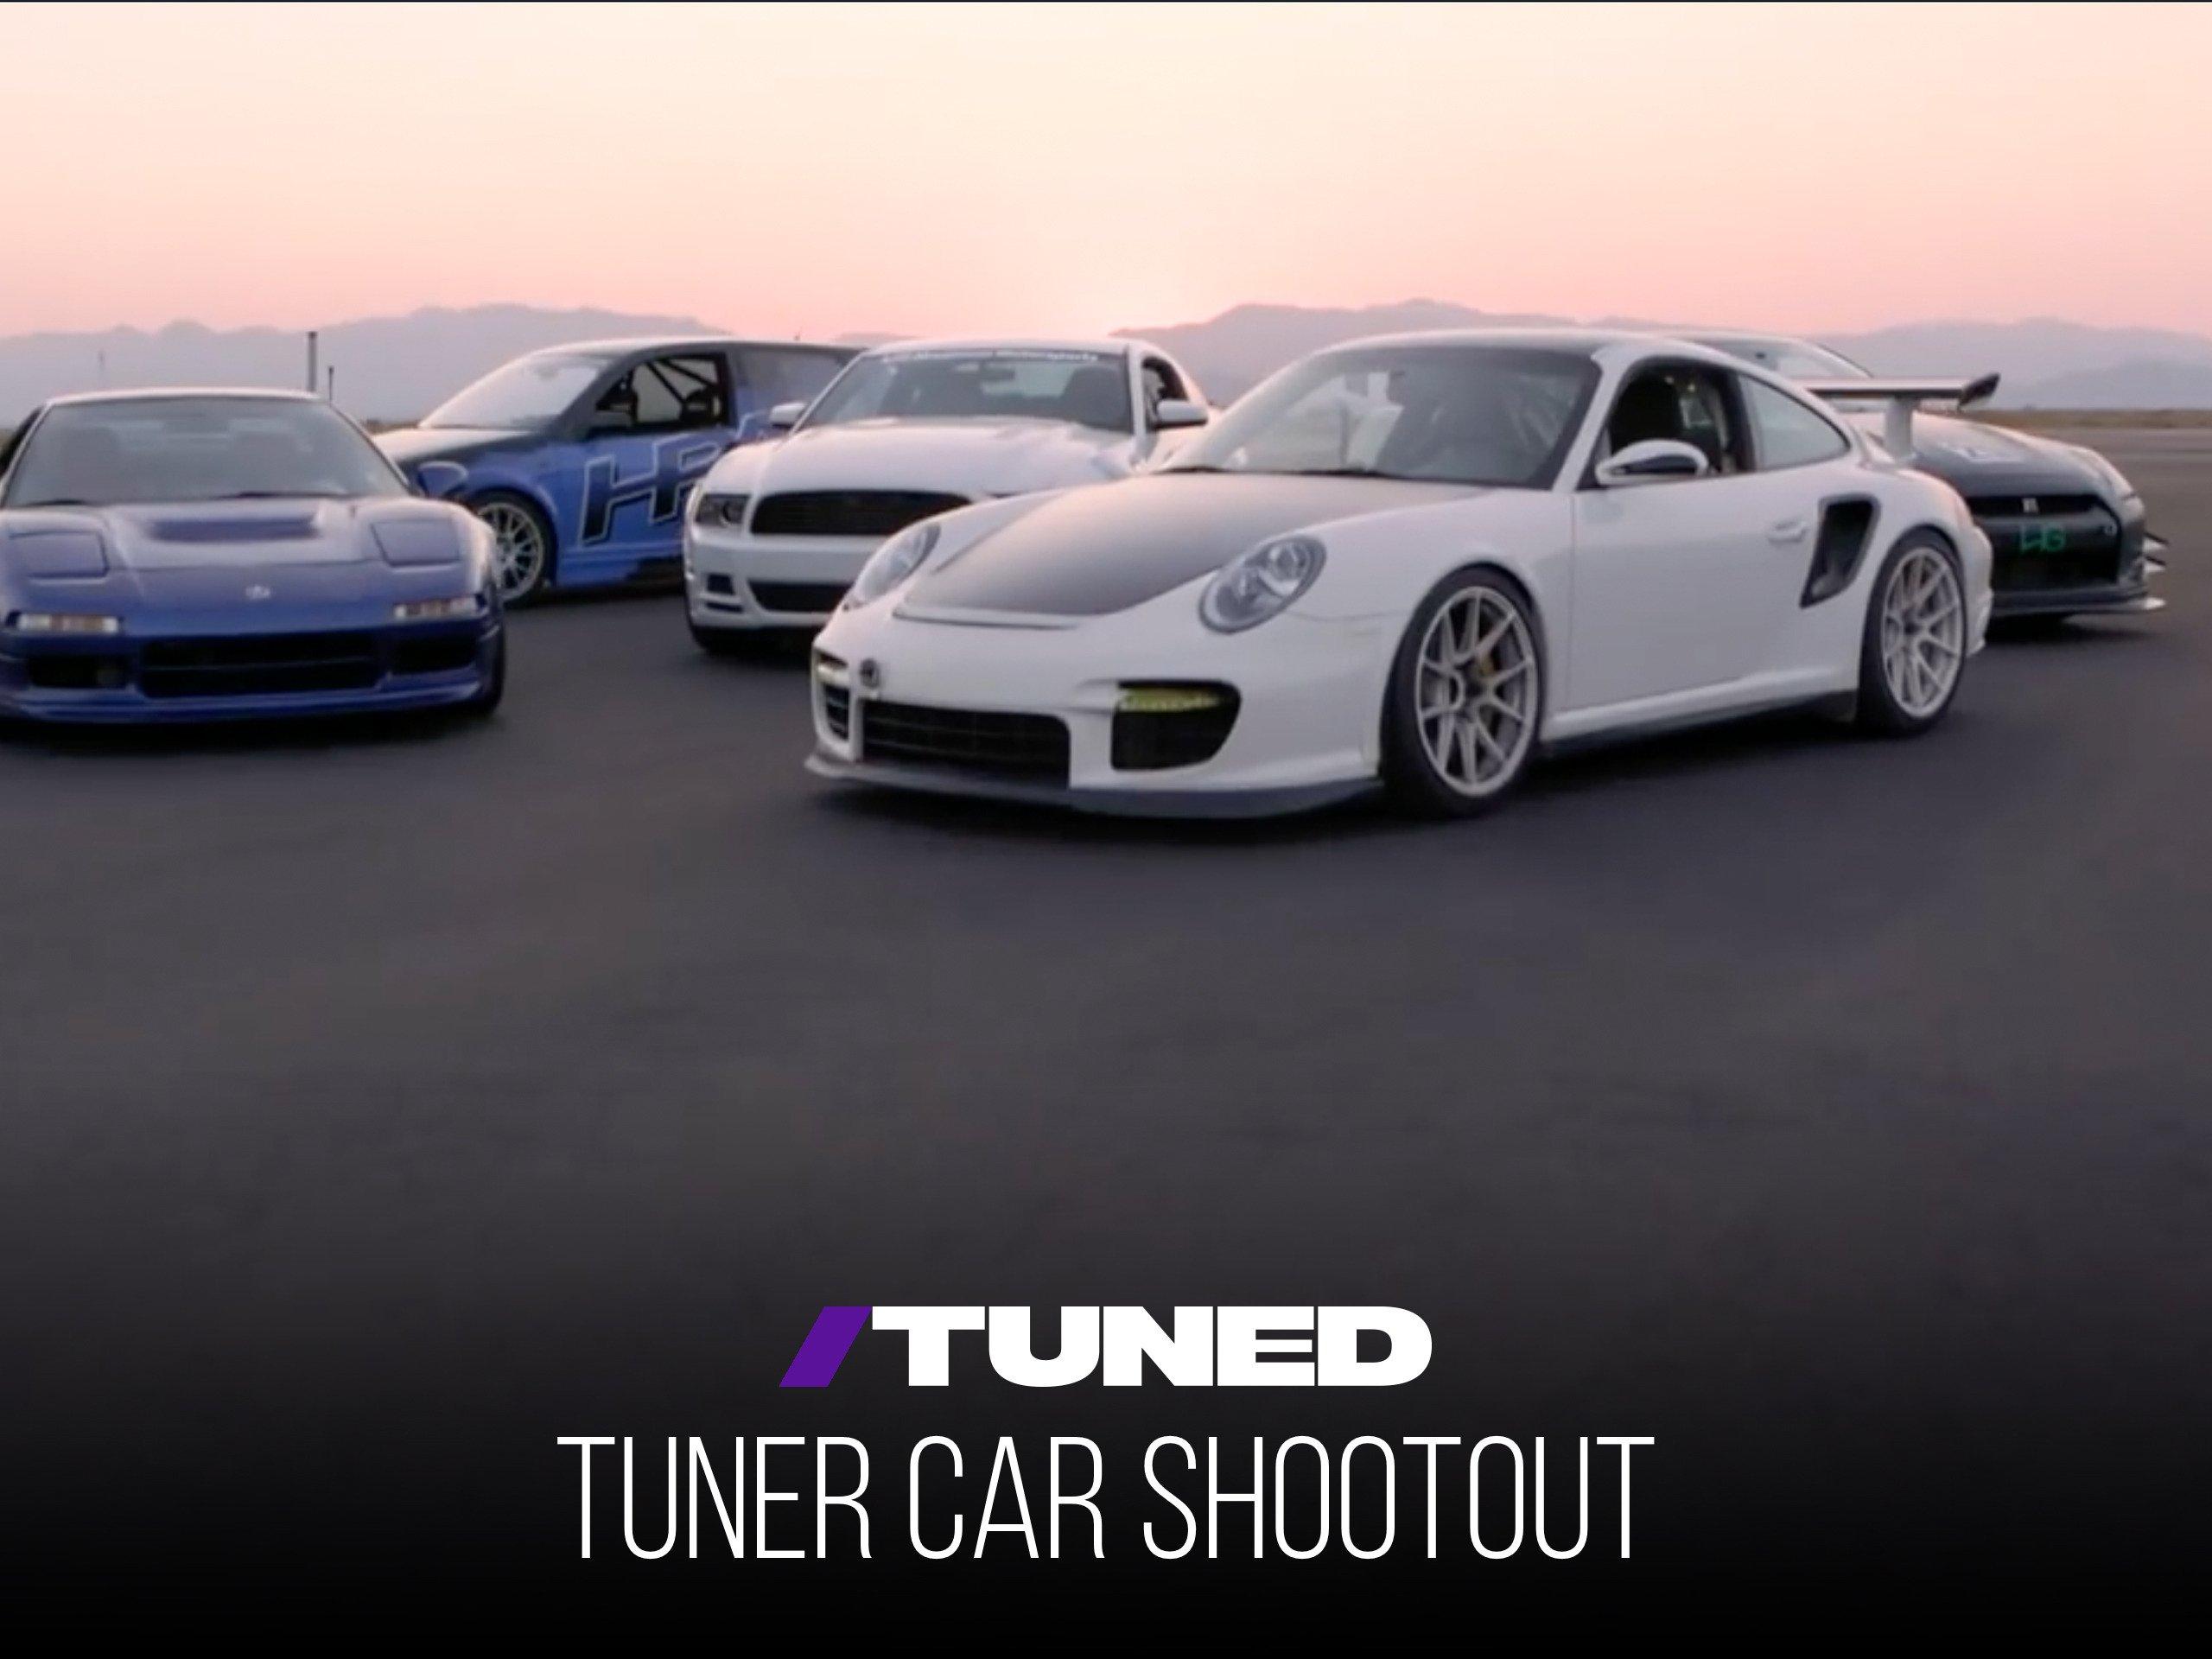 Tuned: Tuner Car Shootout